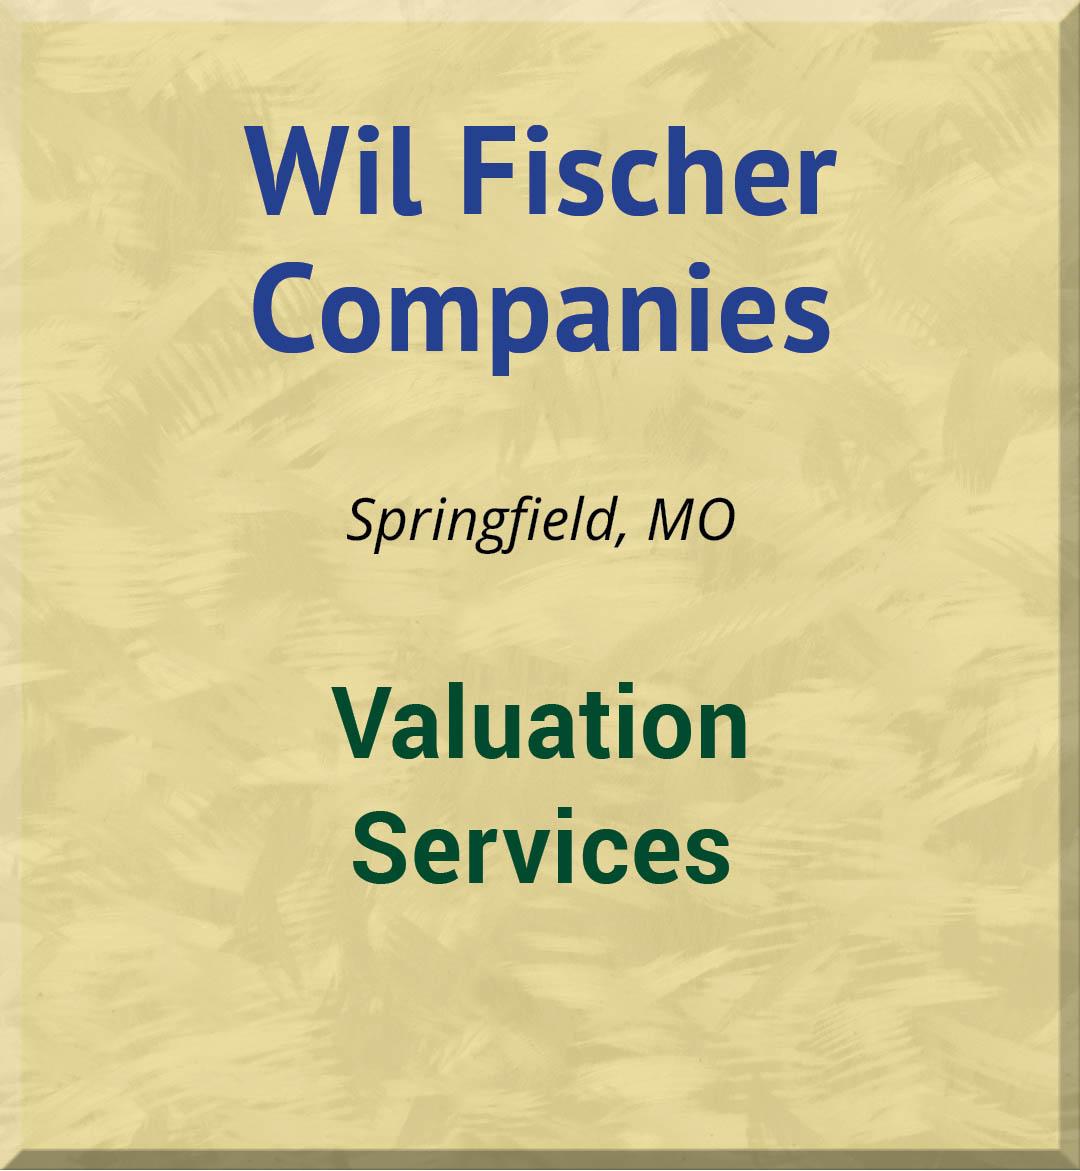 Wil Fischer Companies